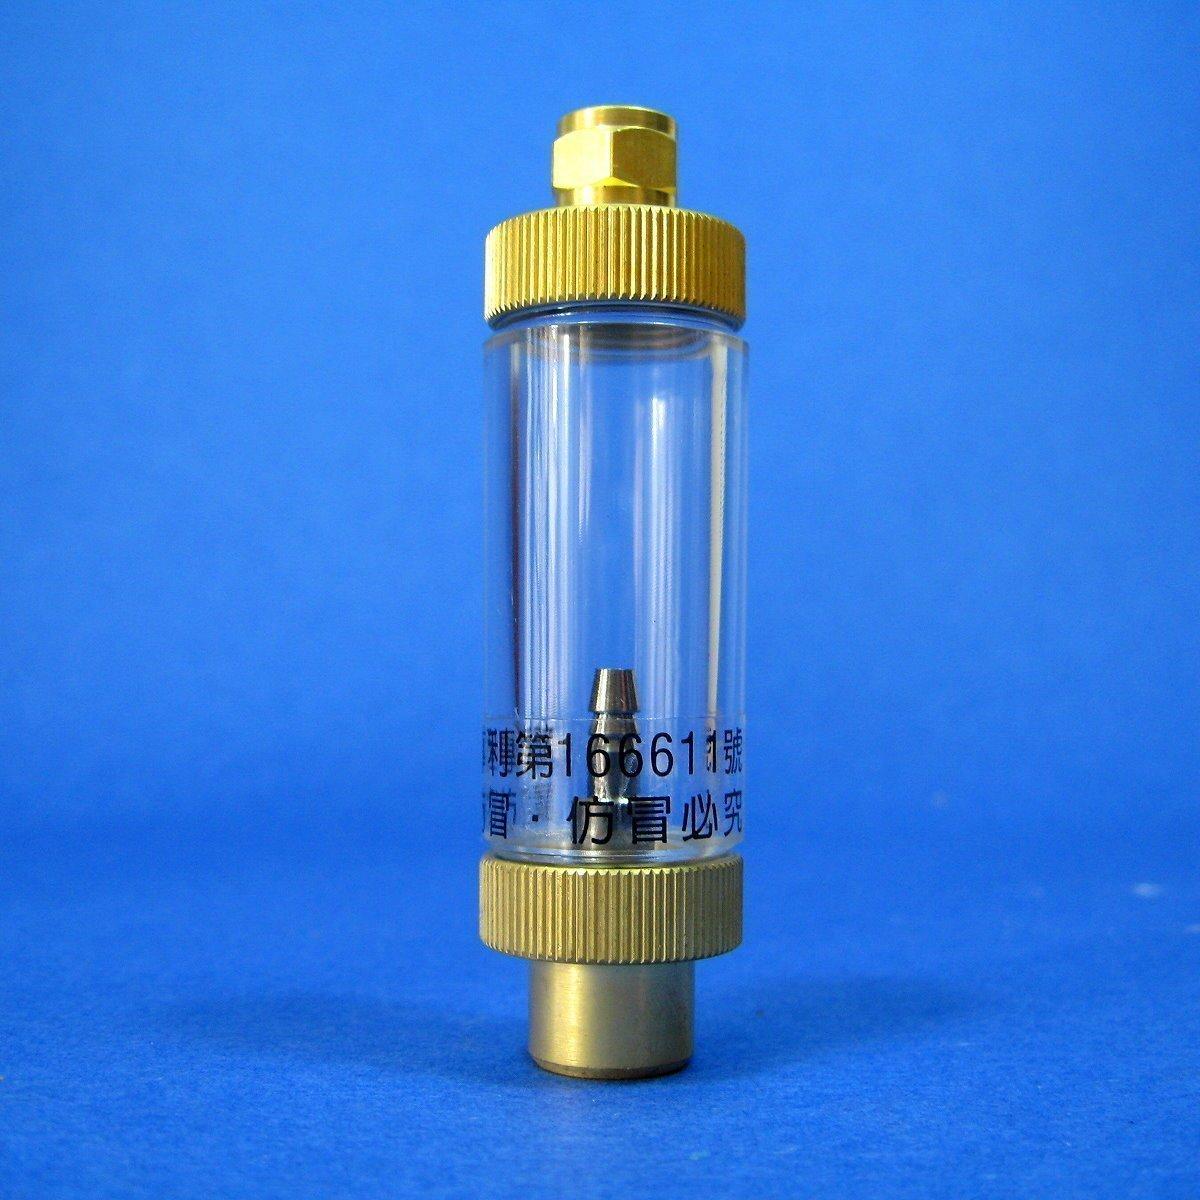 CO2 Bubble Counter & CHECK VALVEaquarium Brass Regulator DIFFUSER Solenoid reactor plants tank